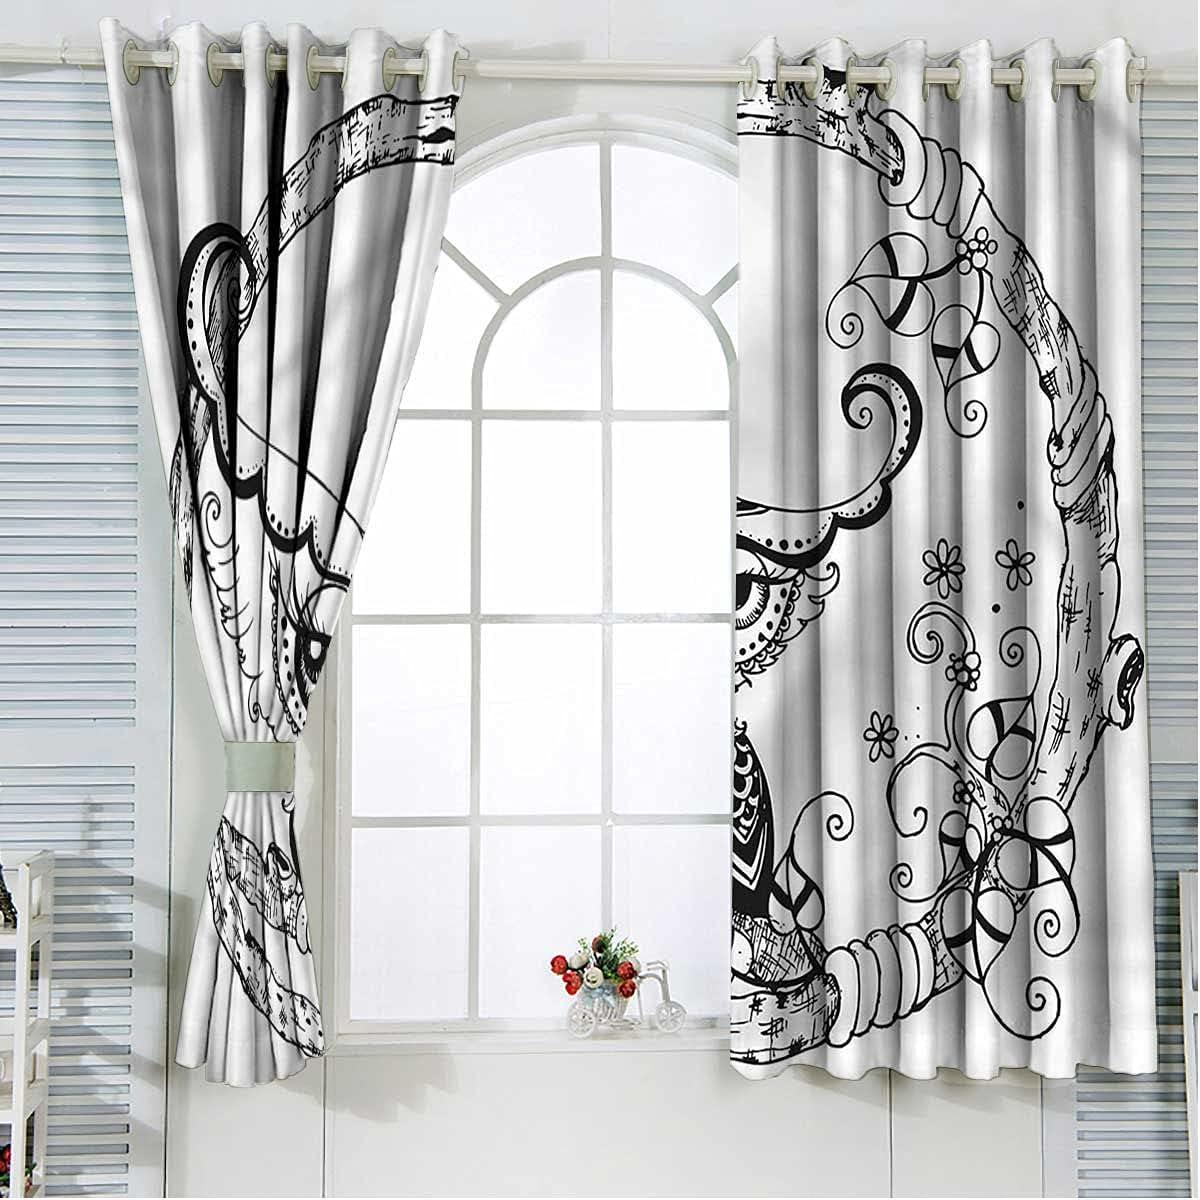 Owl Blackout Curtain Panels 2 Set Inch Industry No. 1 Length 2021 Black 108 Romantic